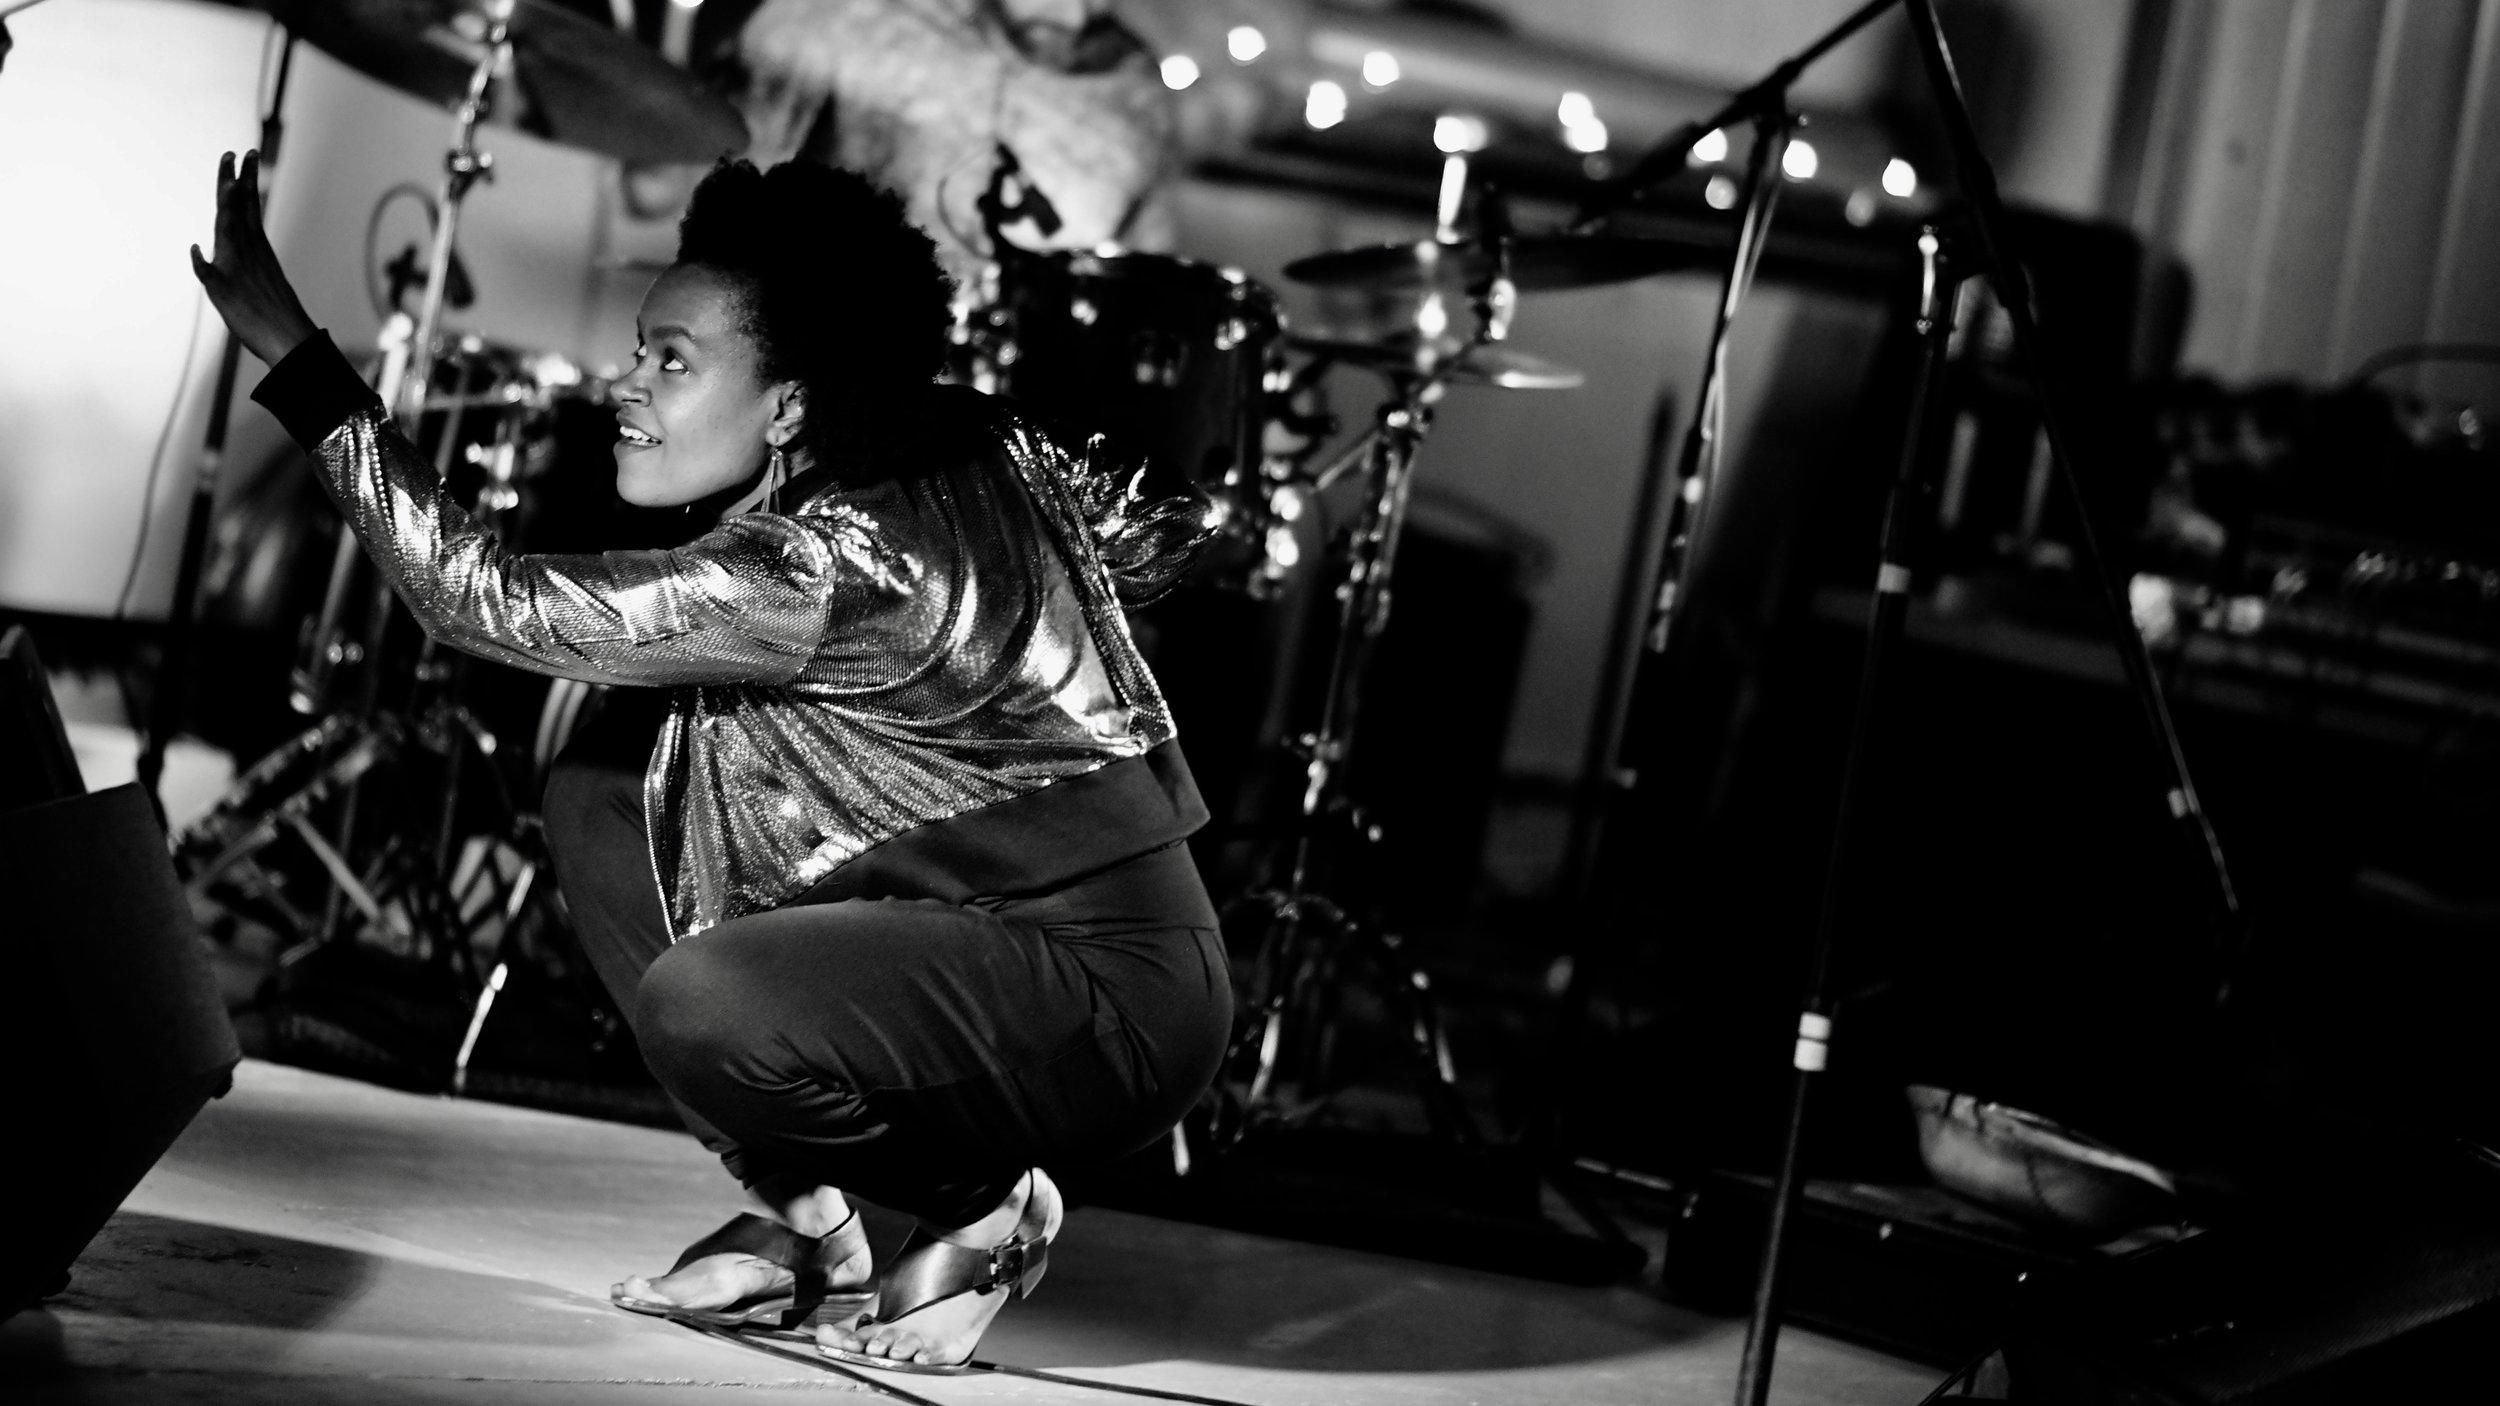 Photo by Ashley Jones @black.white.fullofgray